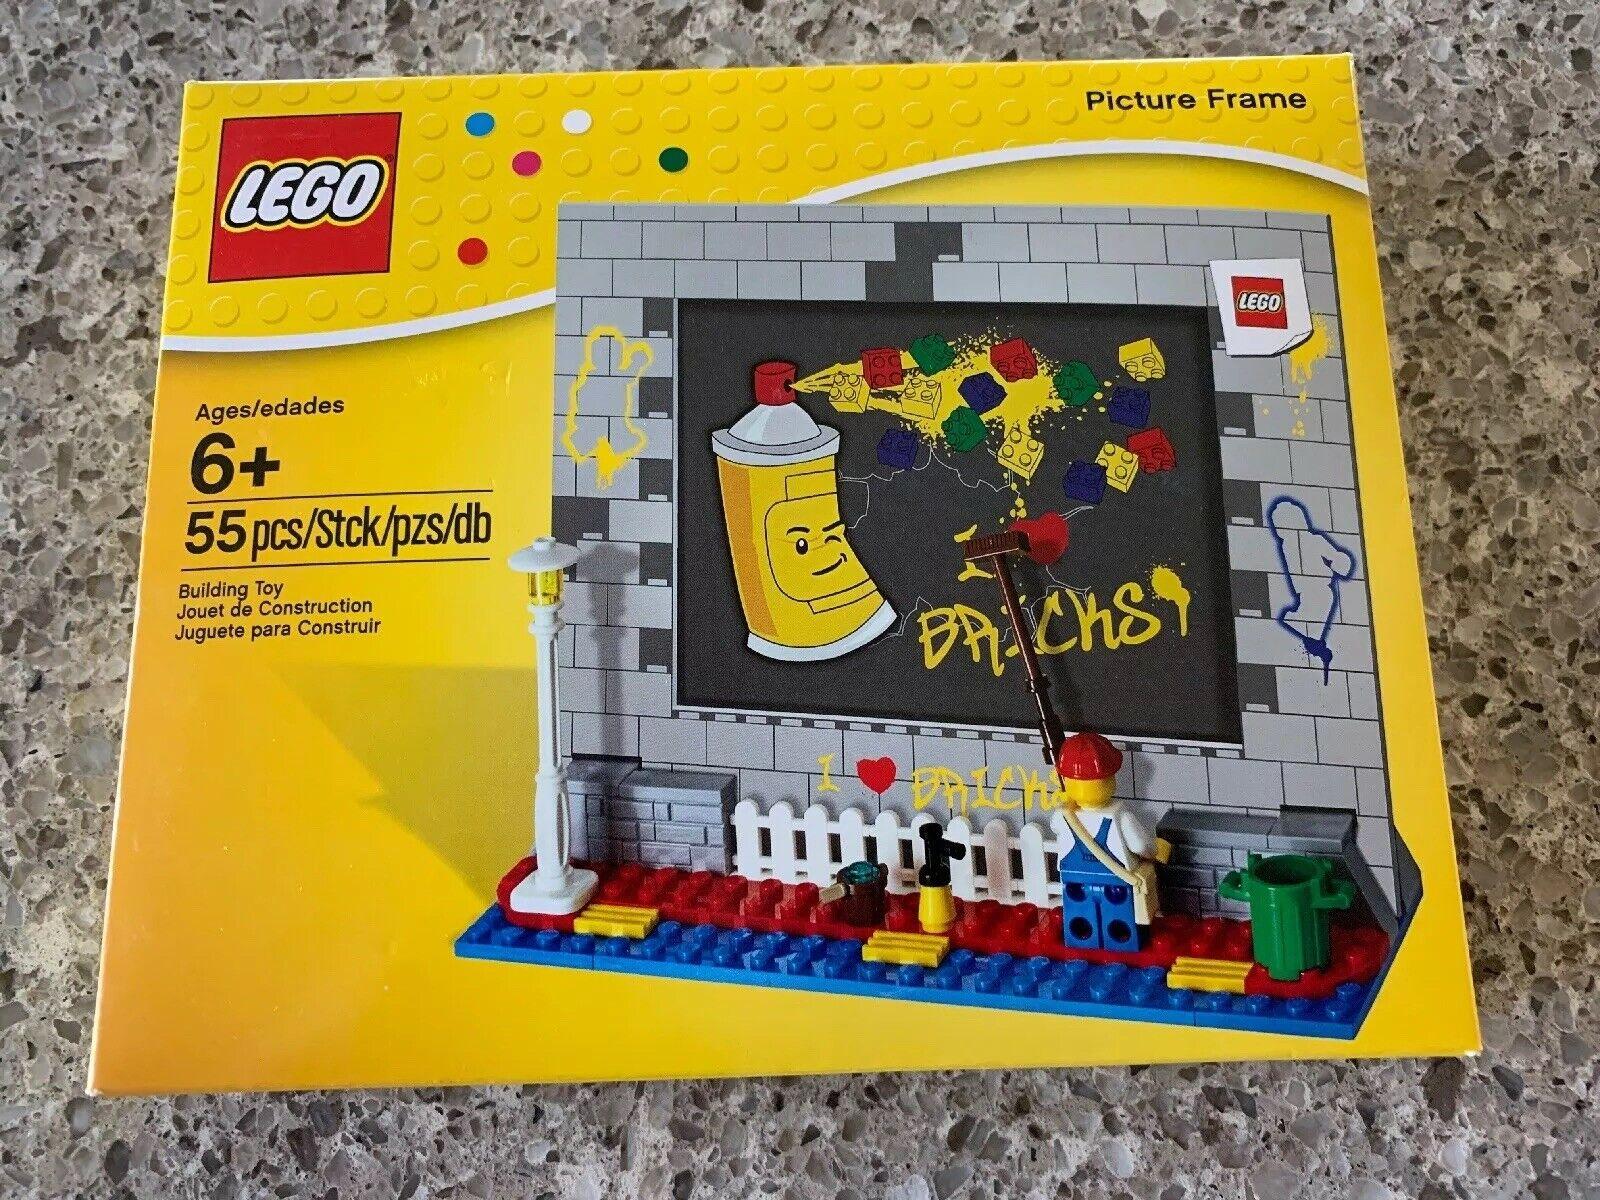 LEGO Picture Frame  850702 - RARE  Complete